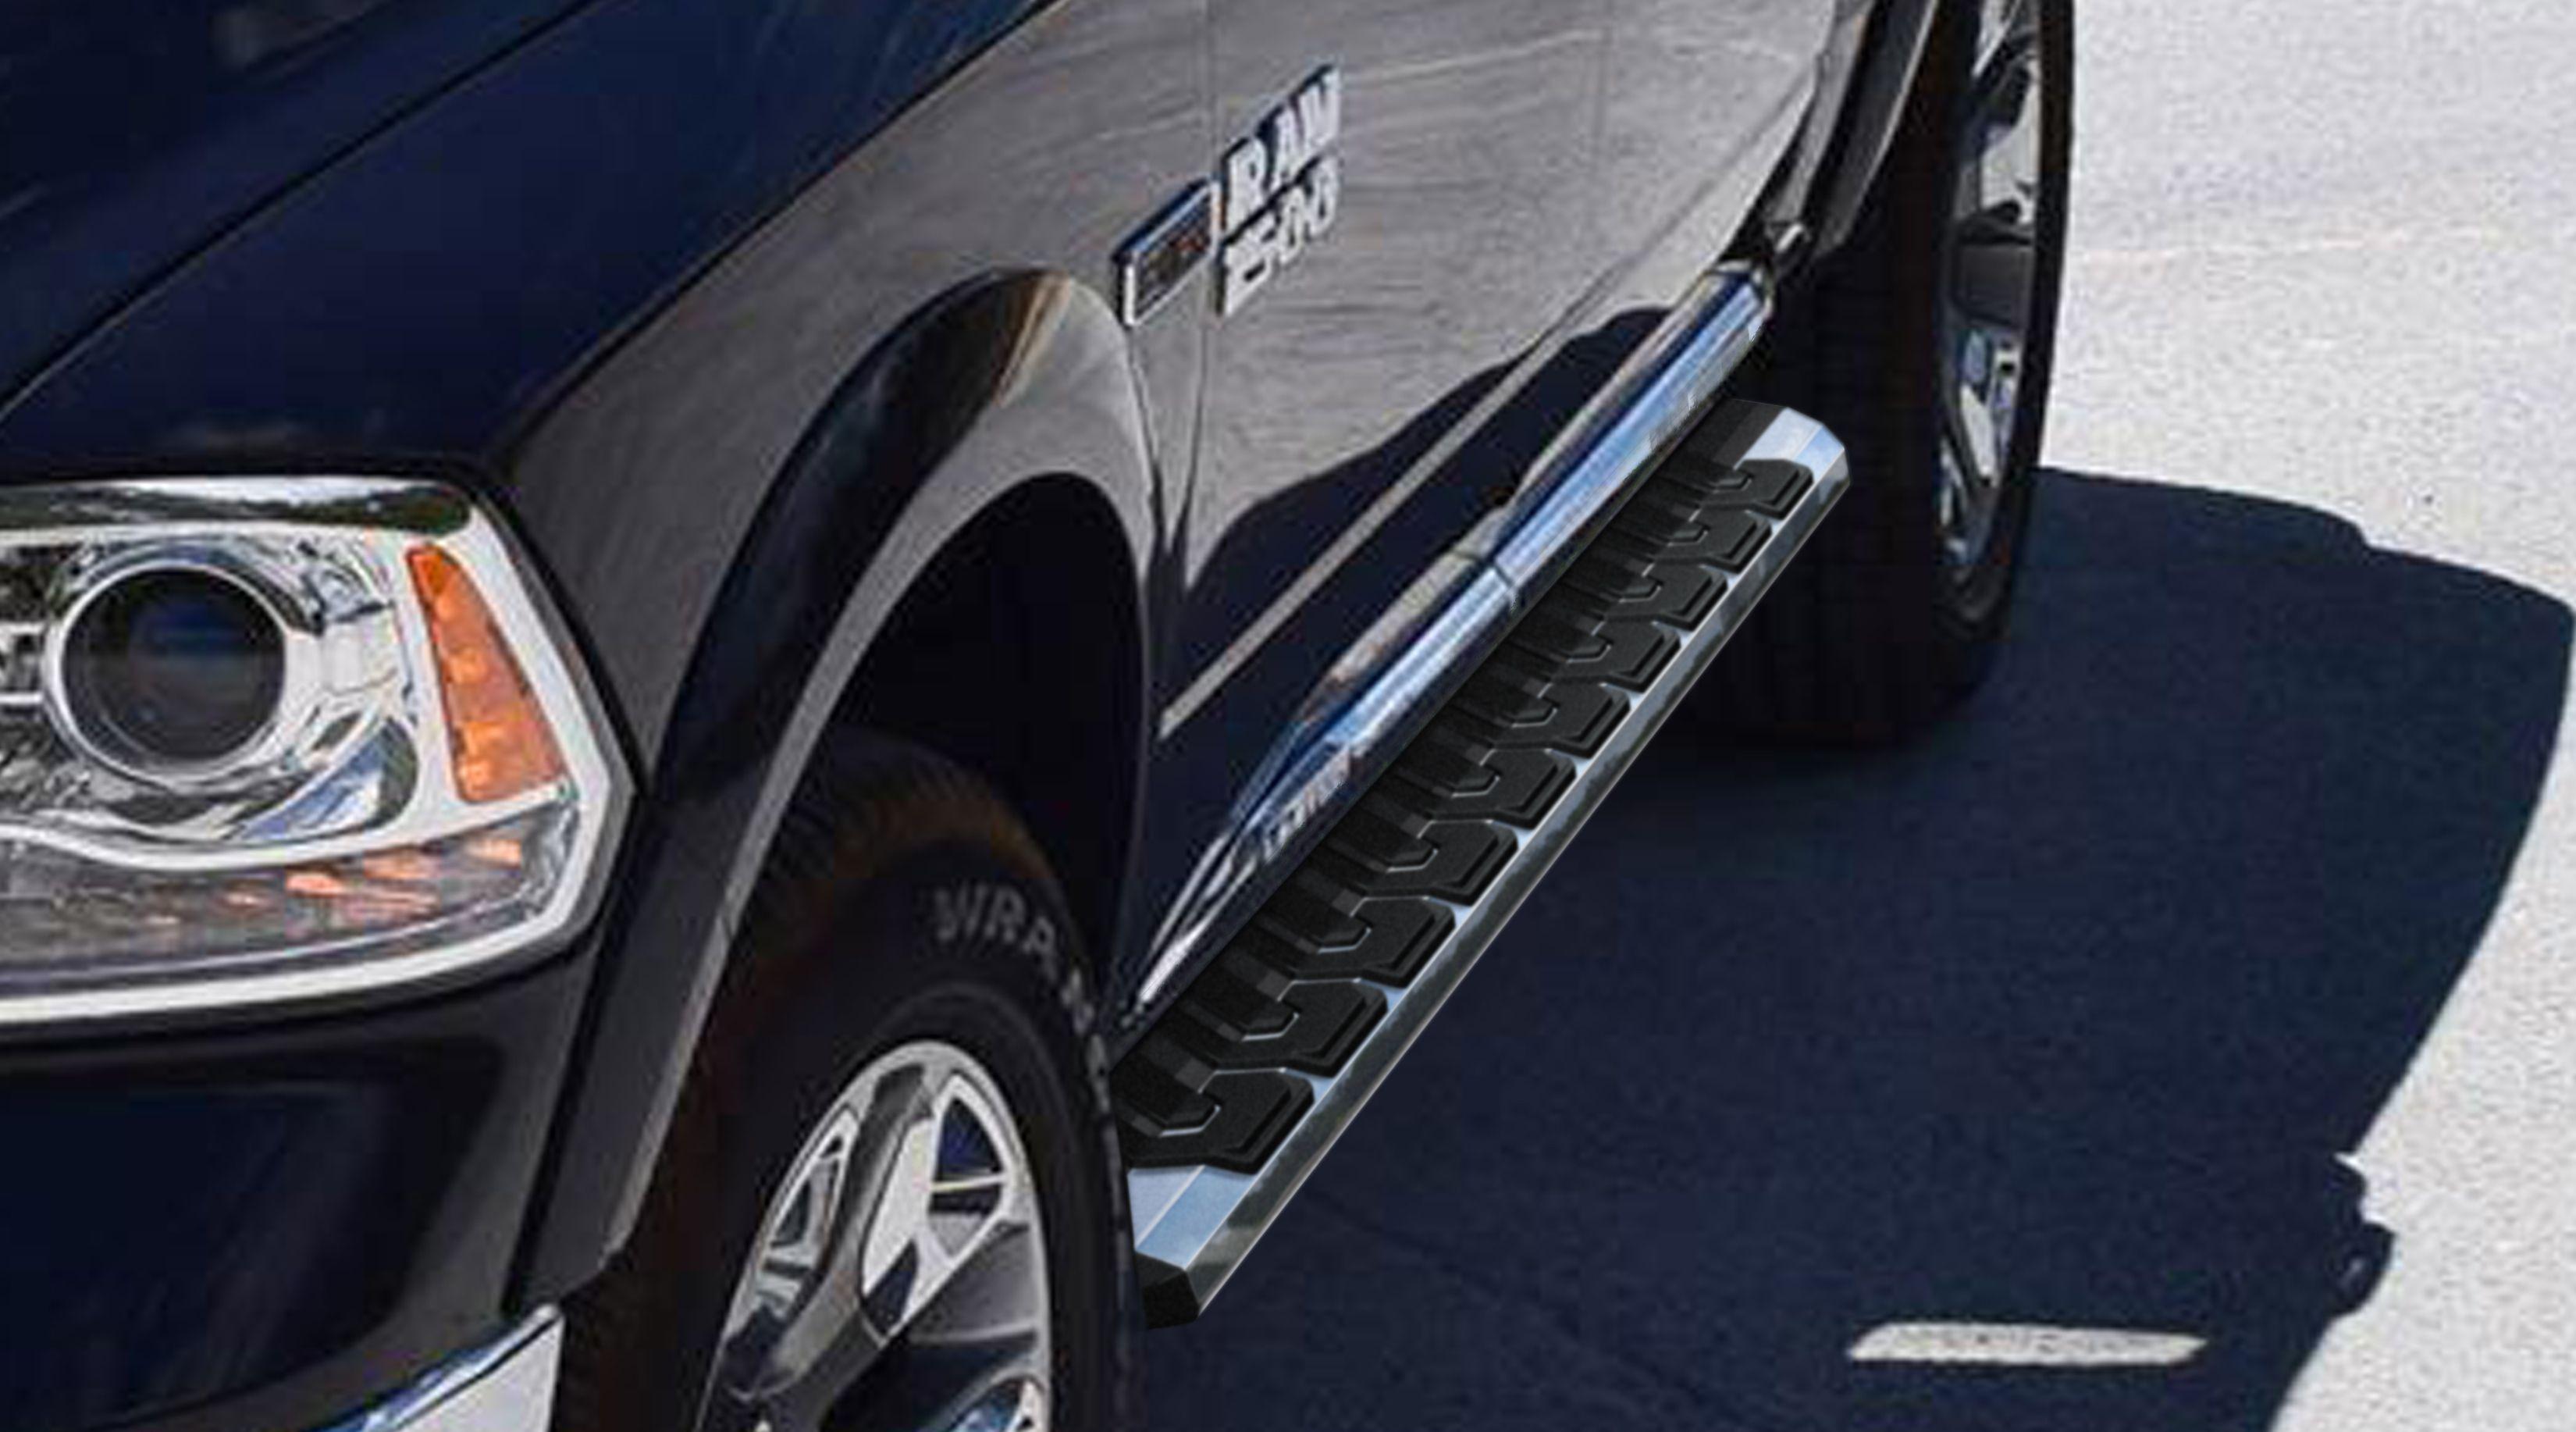 dodge car journey rp sales auto warranty used edmonton dealer sir inventory